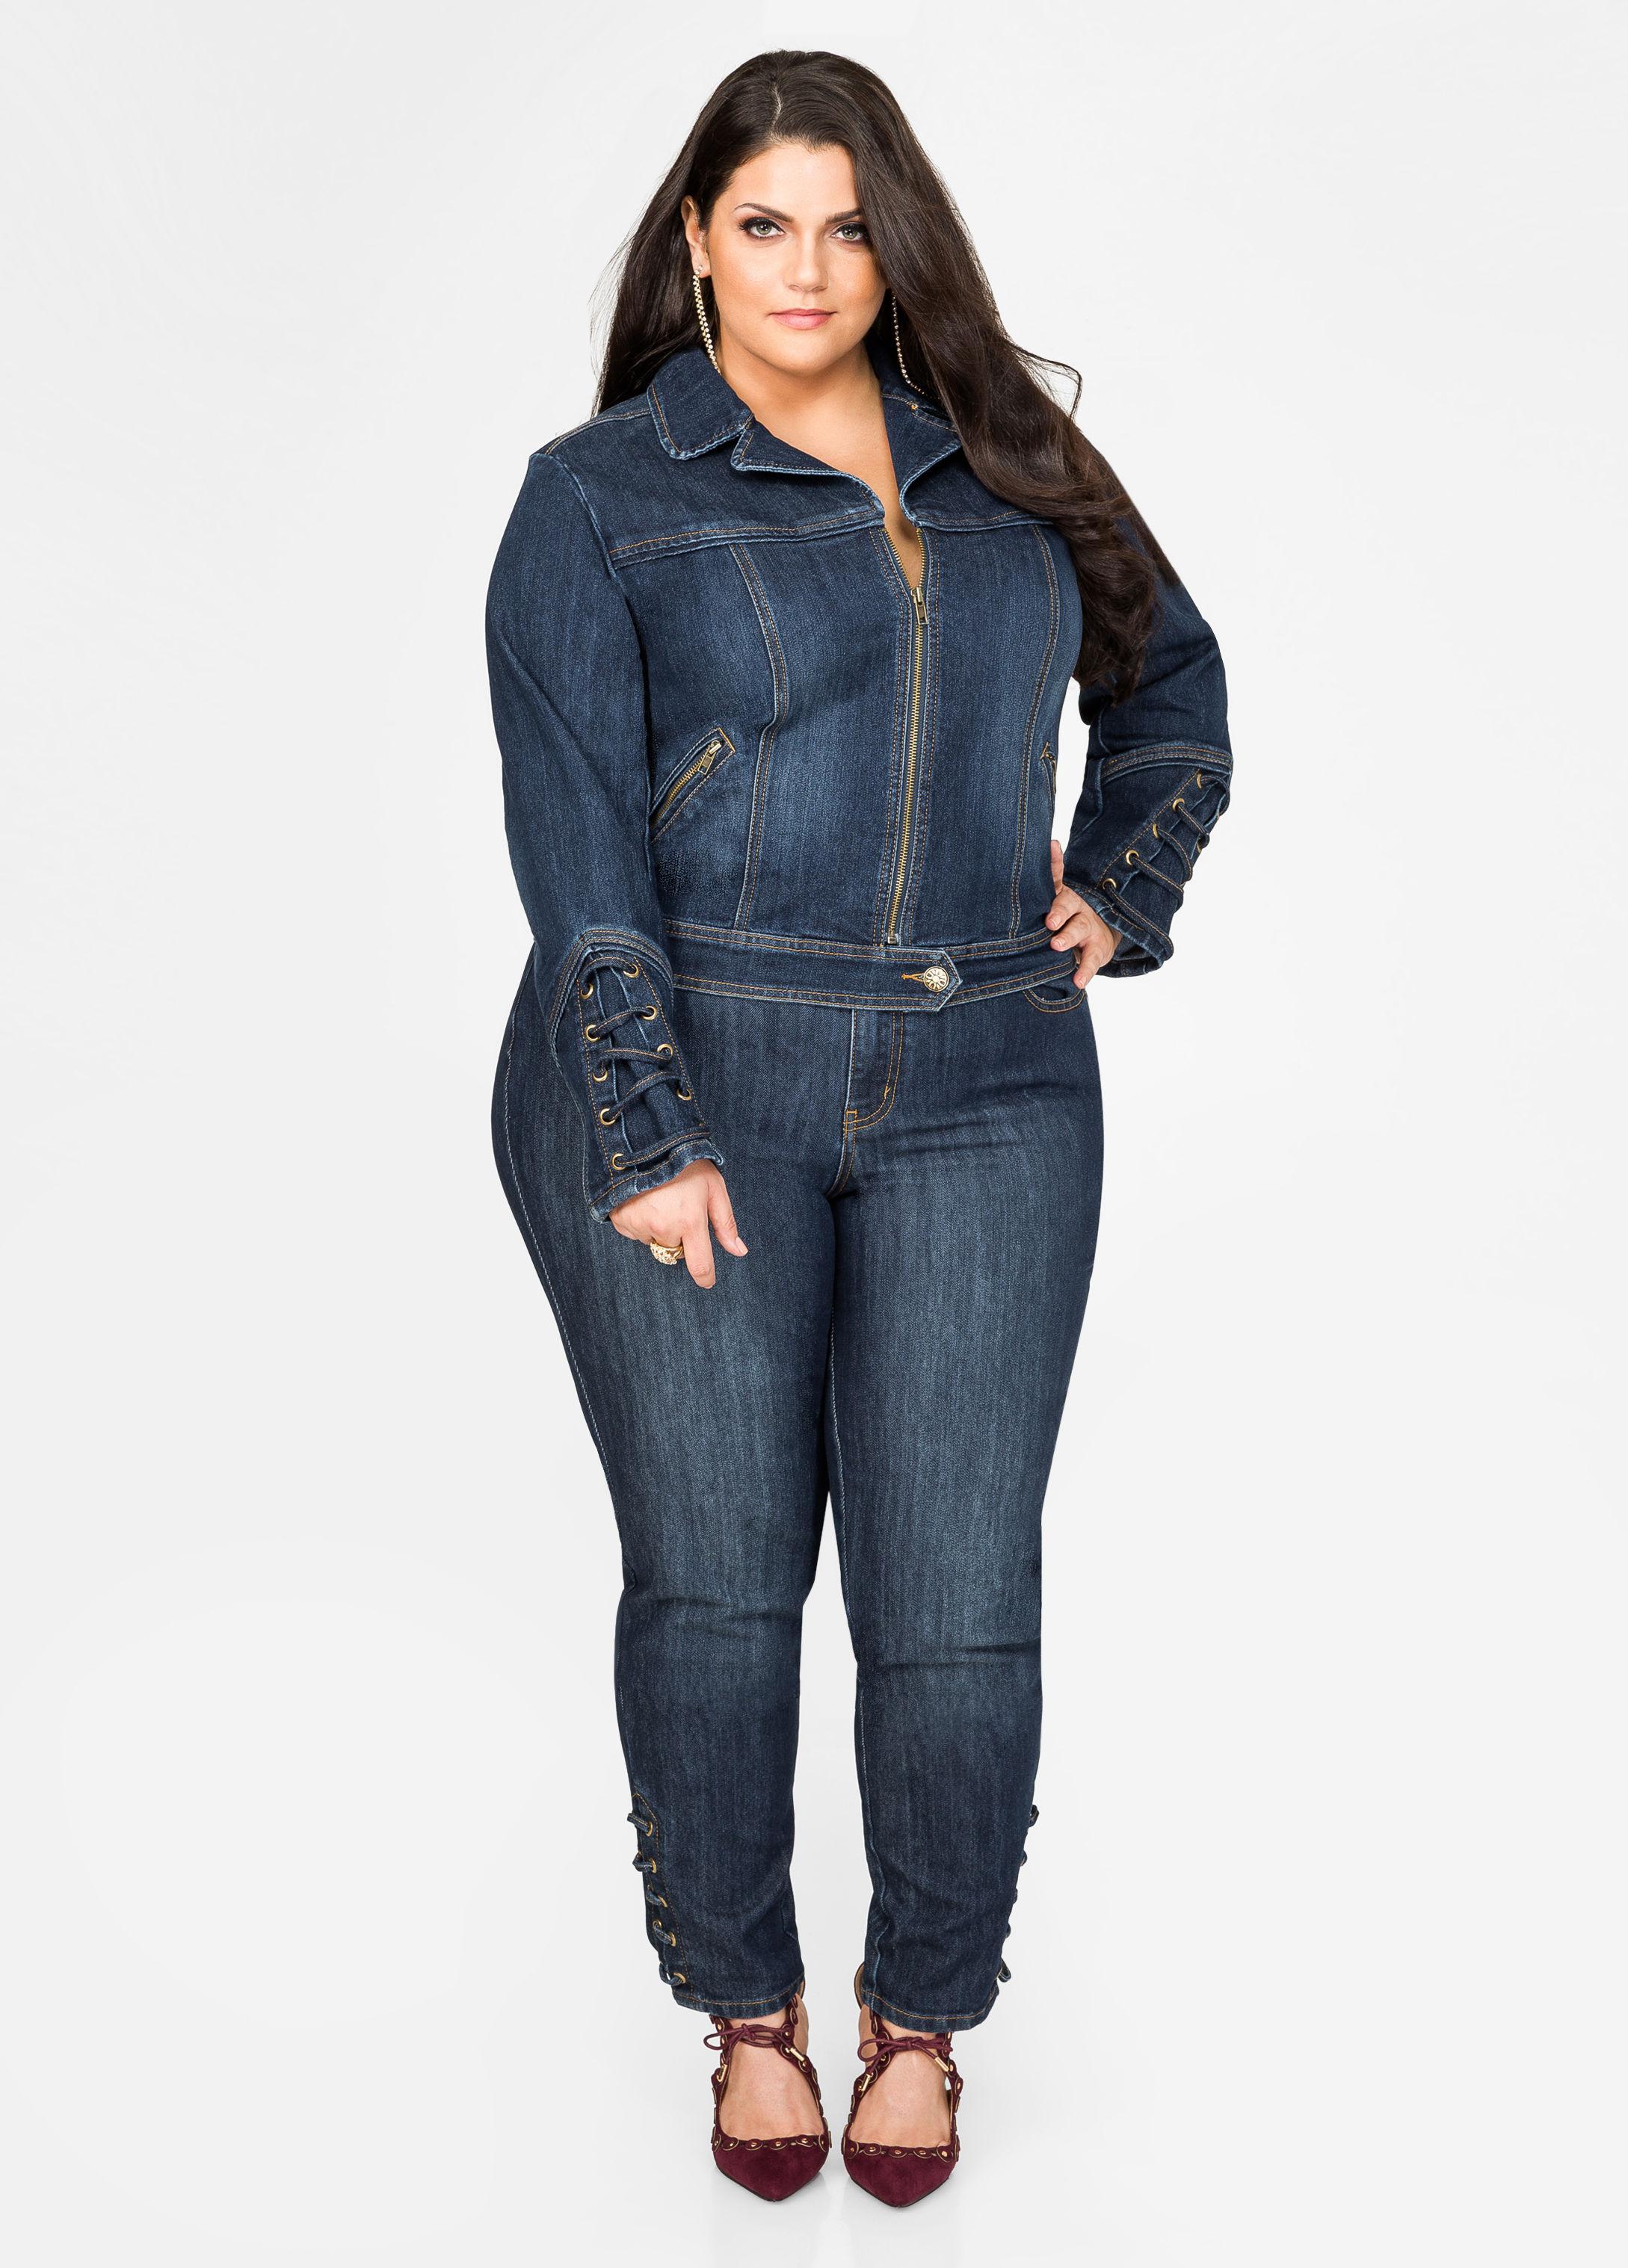 Ashley stewart Lace-up Detail Skinny Jean in Blue